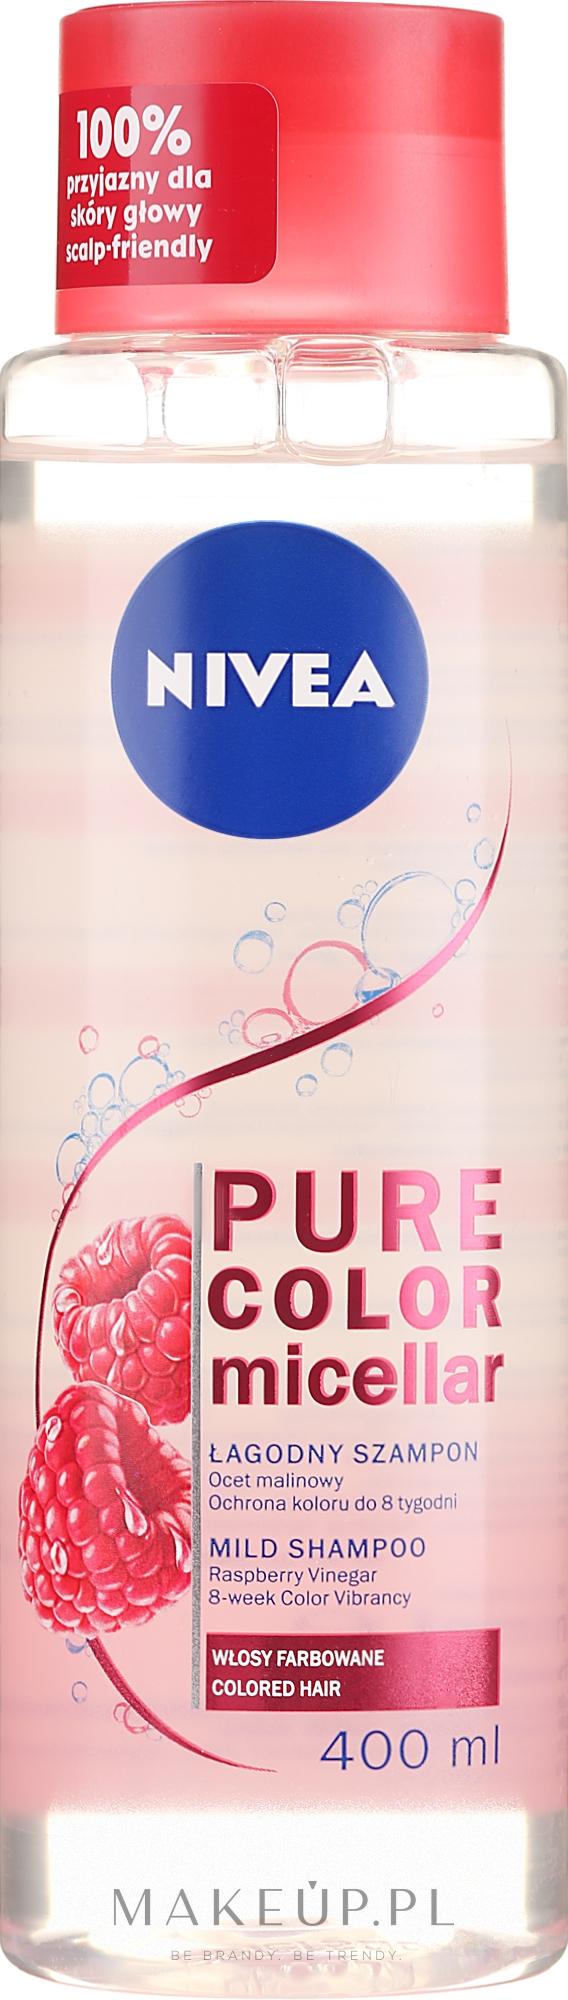 Szampon micelarny do włosów farbowanych i z pasemkami - Nivea Pure Color Micellar Shampoo — фото 400 ml